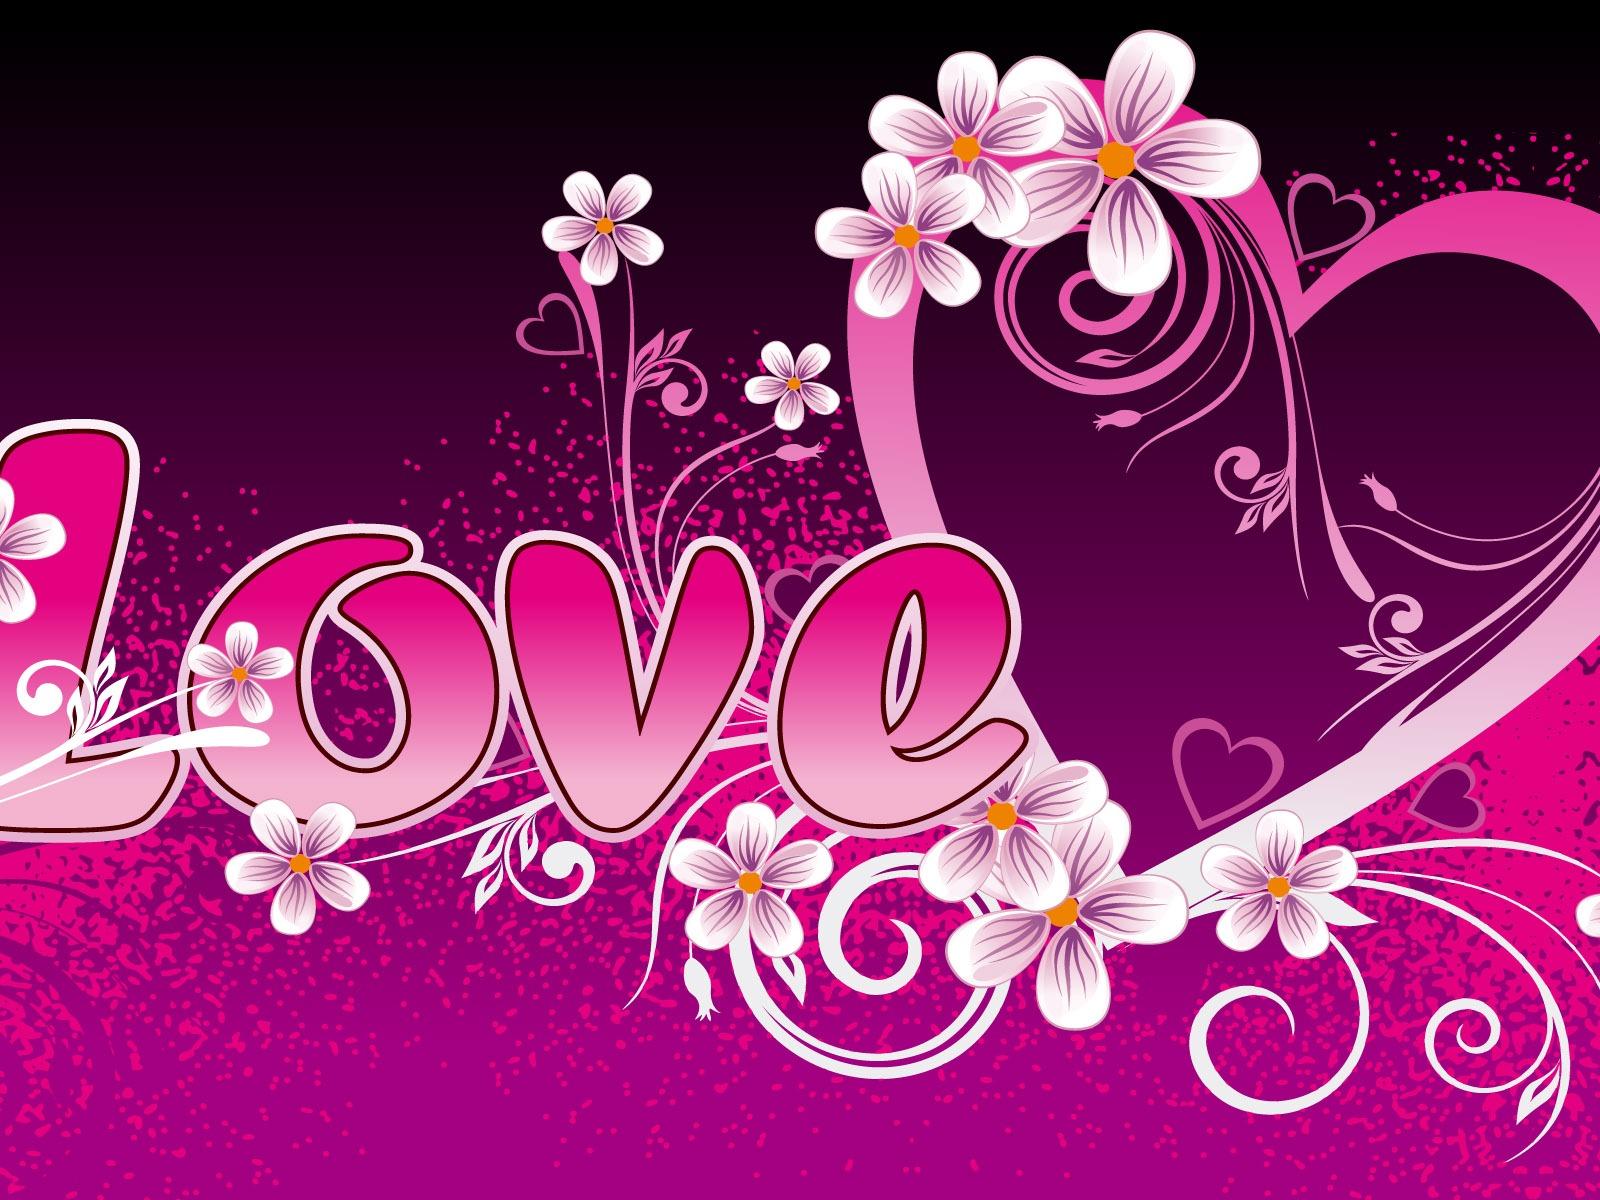 love theme wallpaper,text,pink,font,heart,graphic design